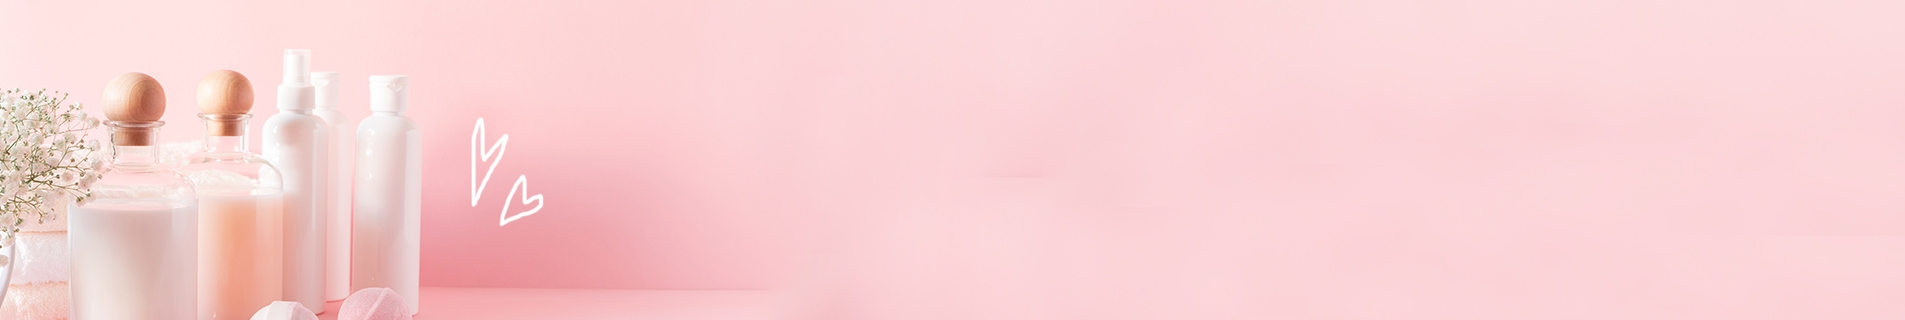 Parfum de marque pas cher | Cosmétique corps |  SAGA Cosmetics